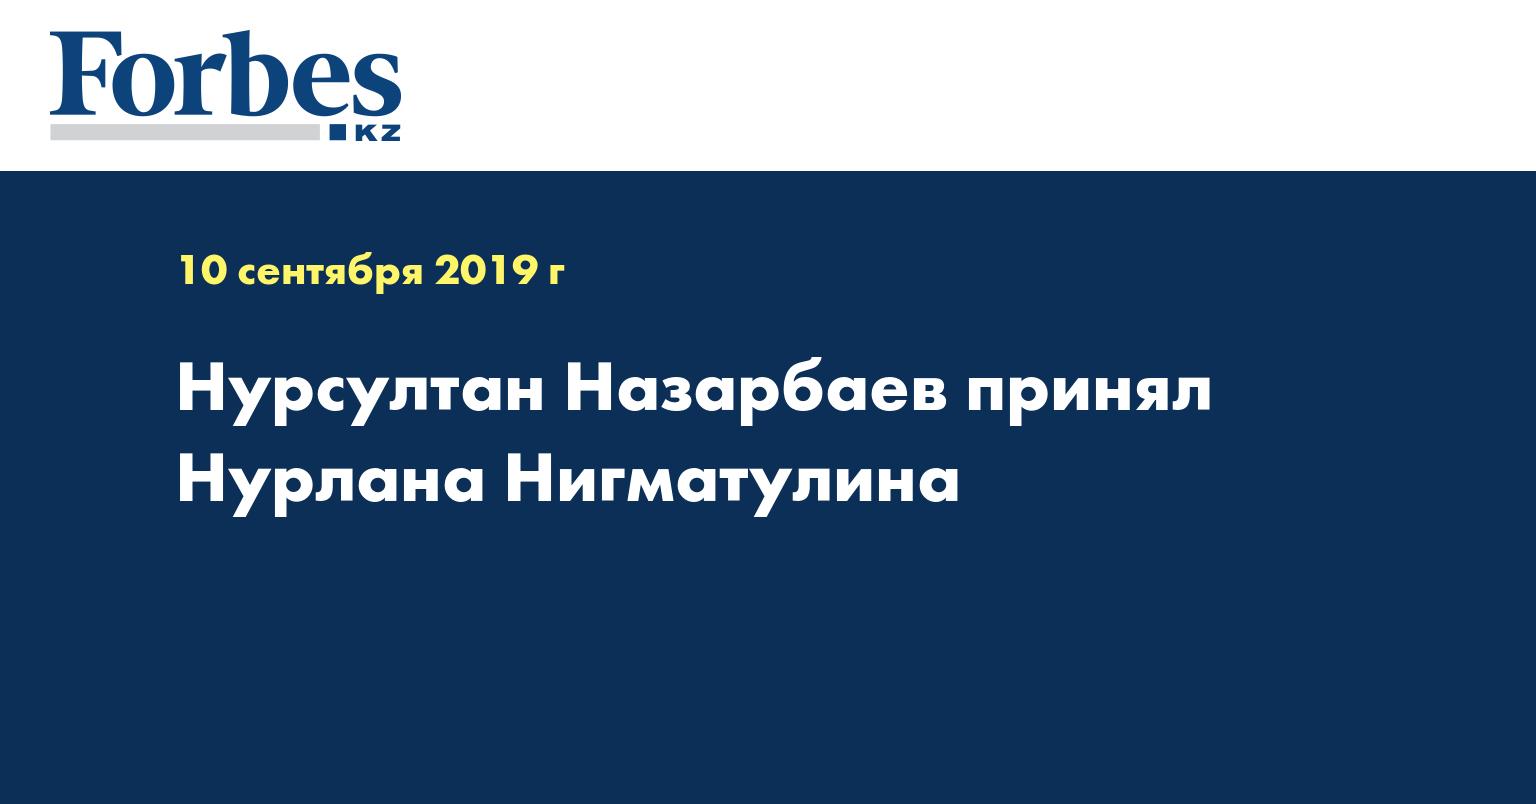 Нурсултан Назарбаев принял Нурлана Нигматулина